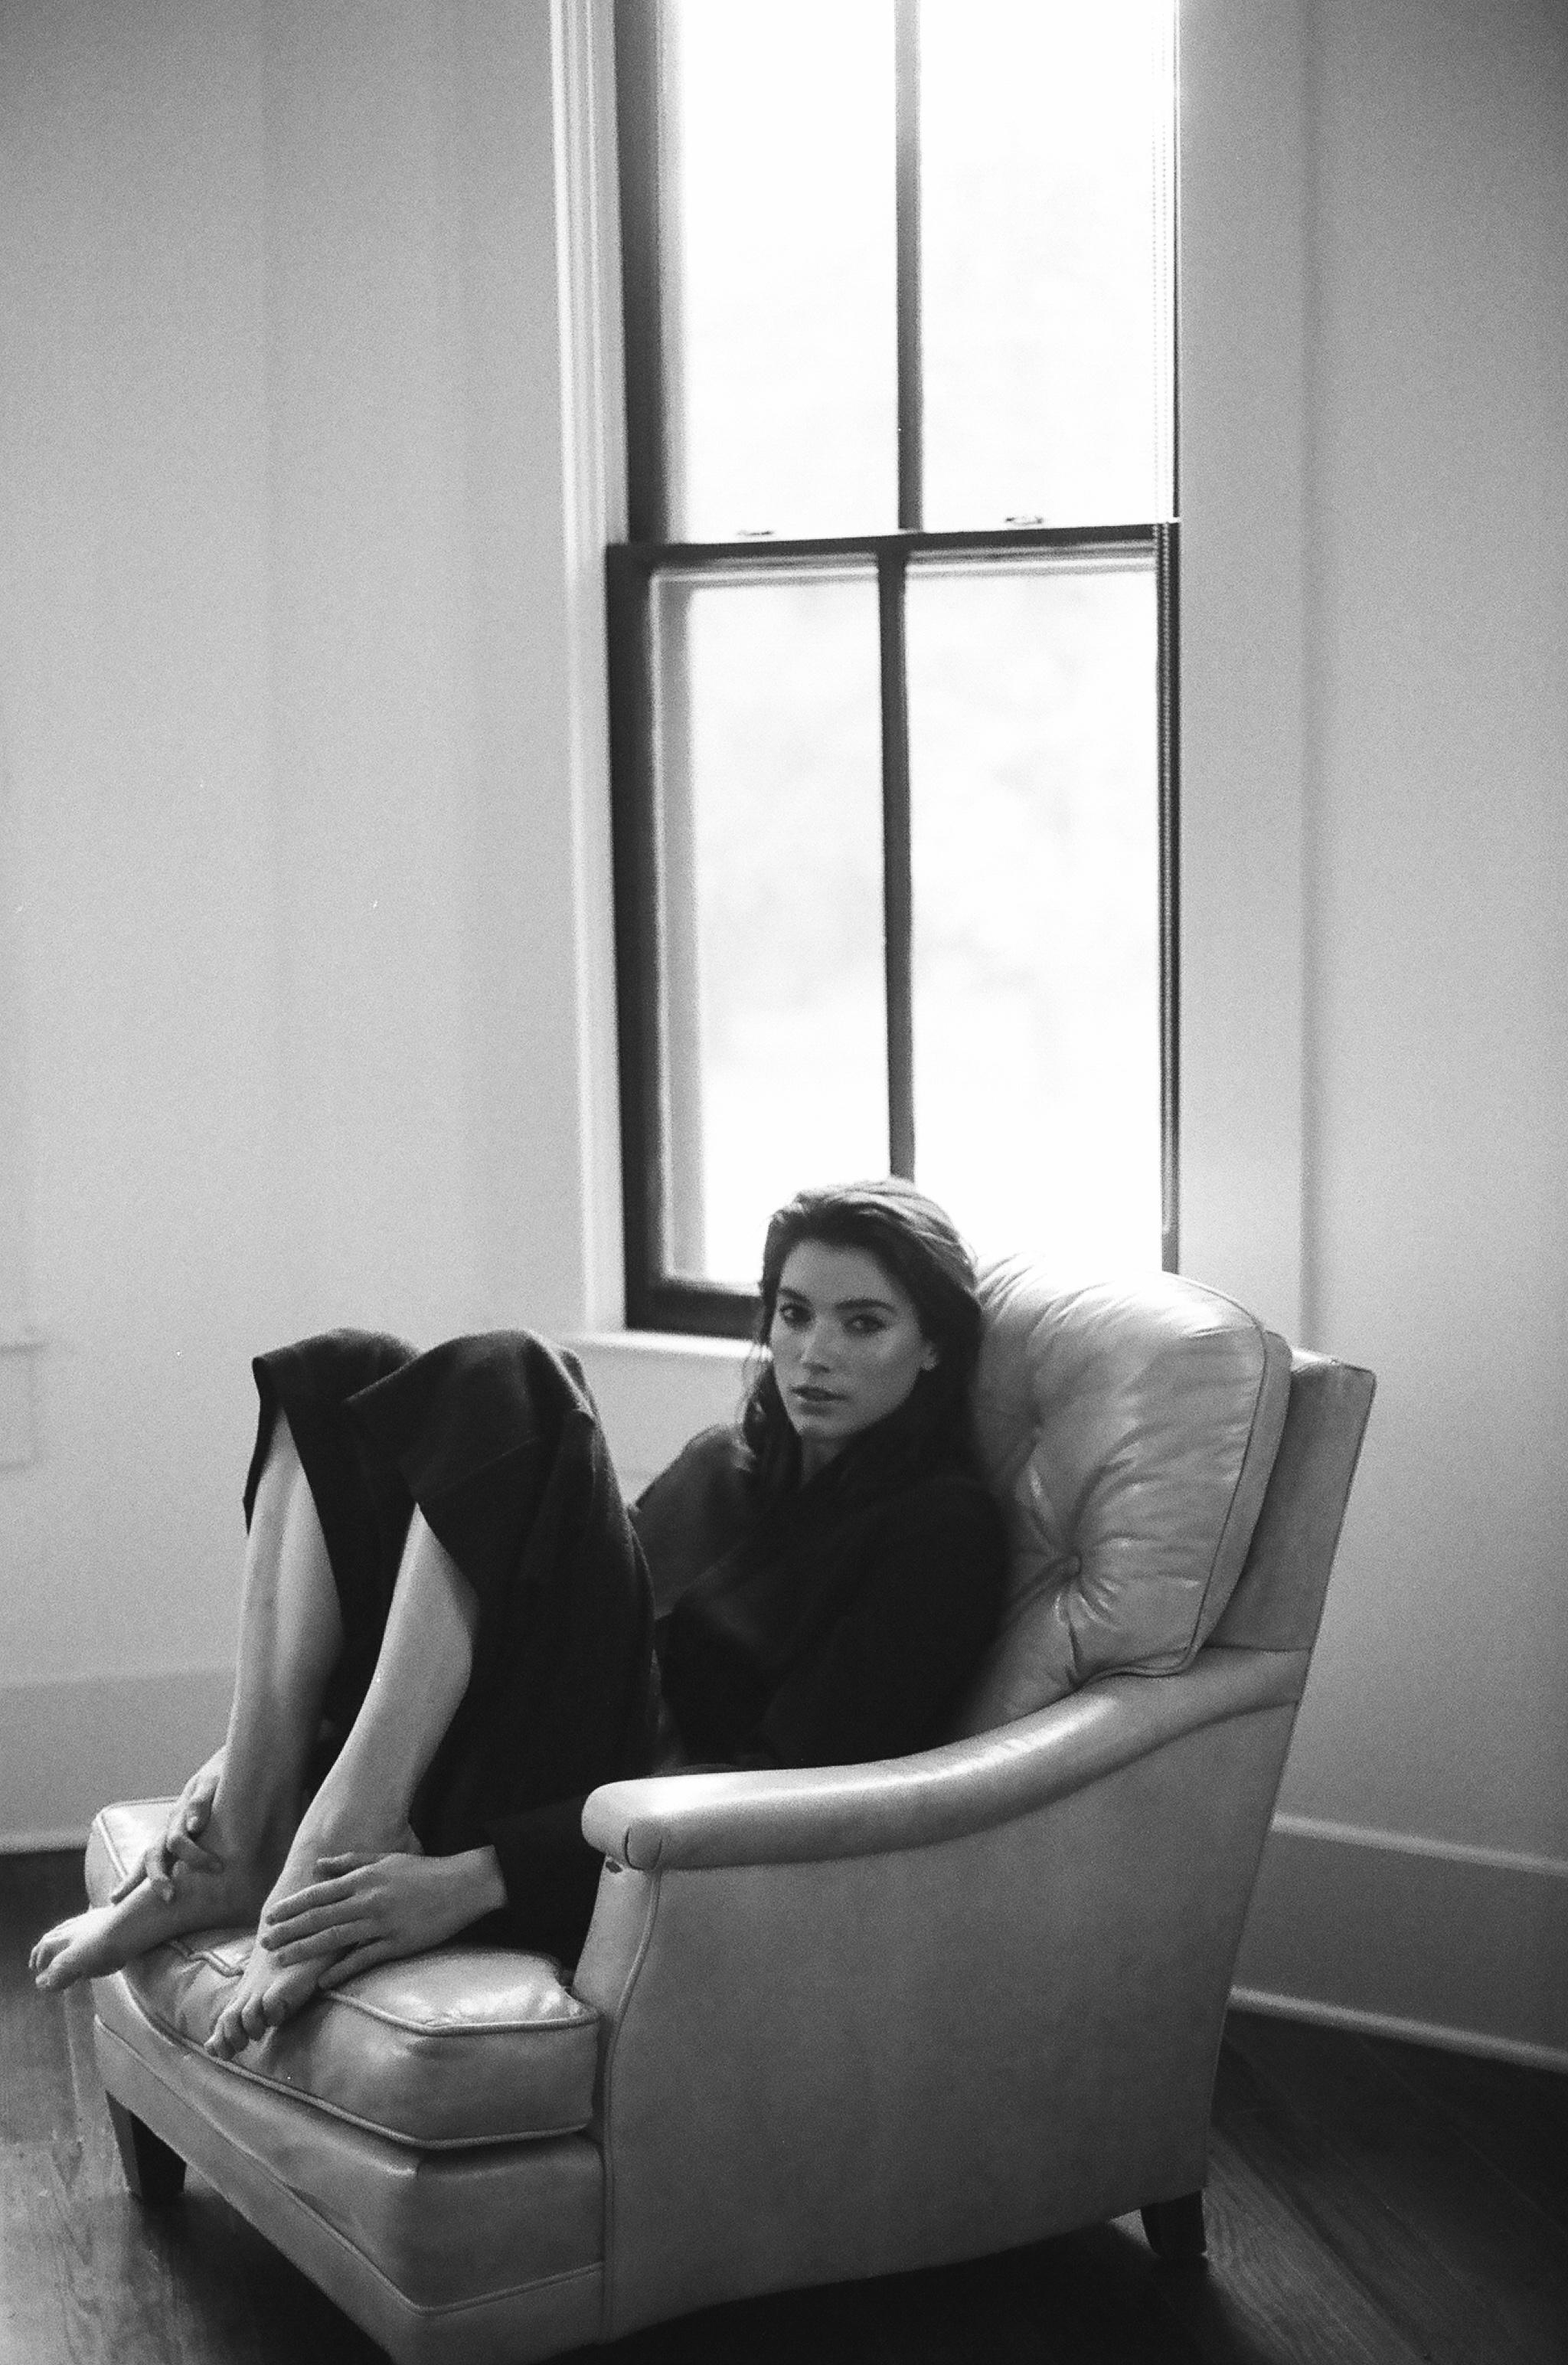 Photo by Kate LeSueur